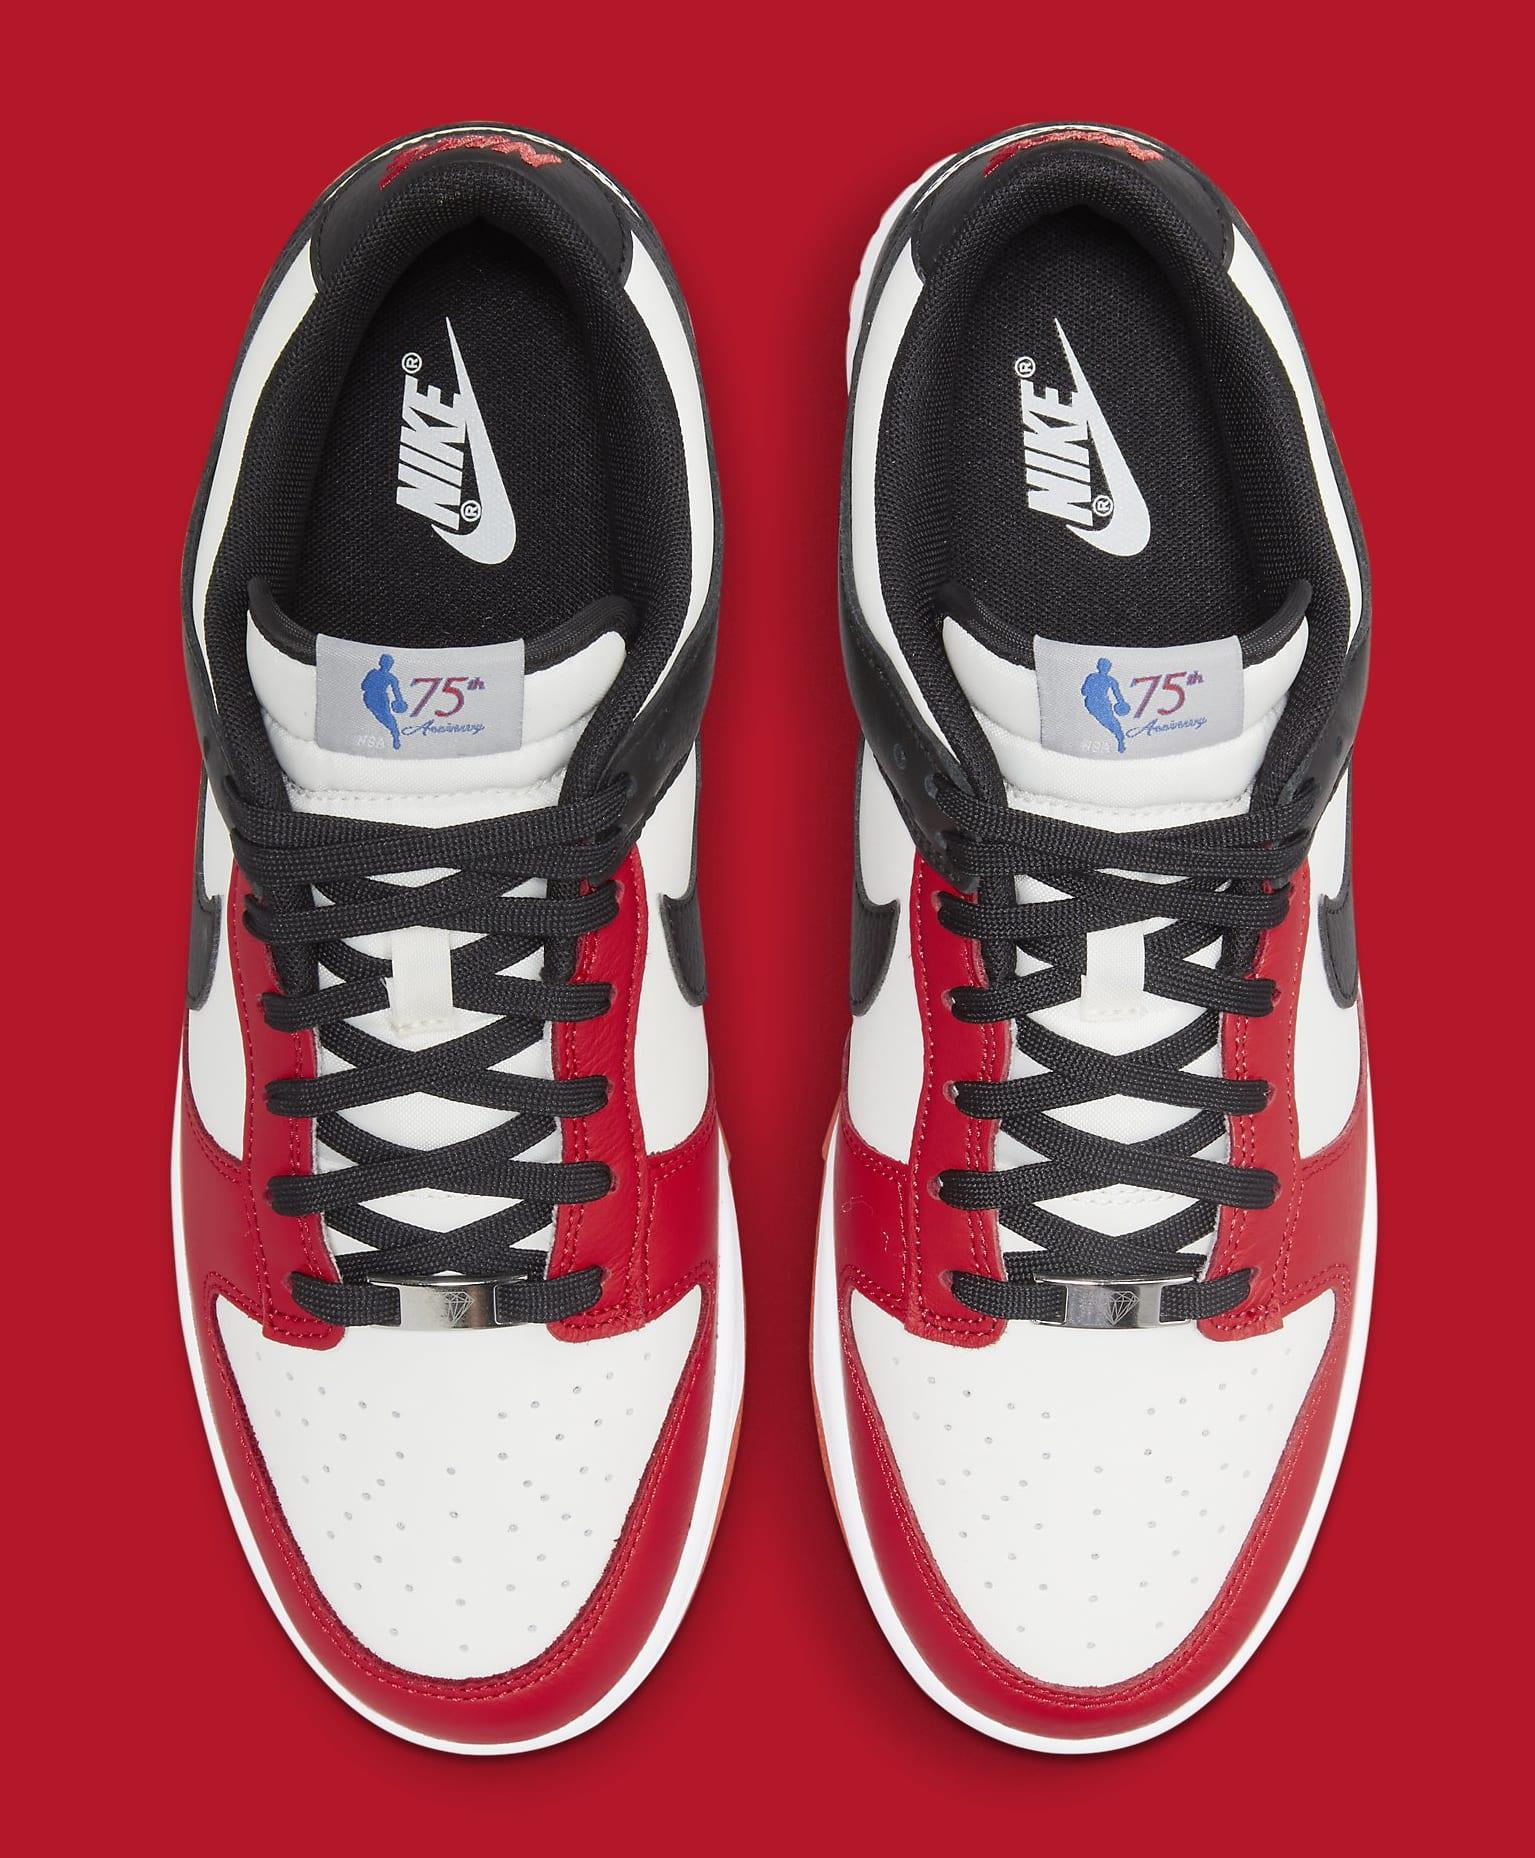 Nike Dunk Low 'NBA 75th Anniversary' DD3363-100 Top